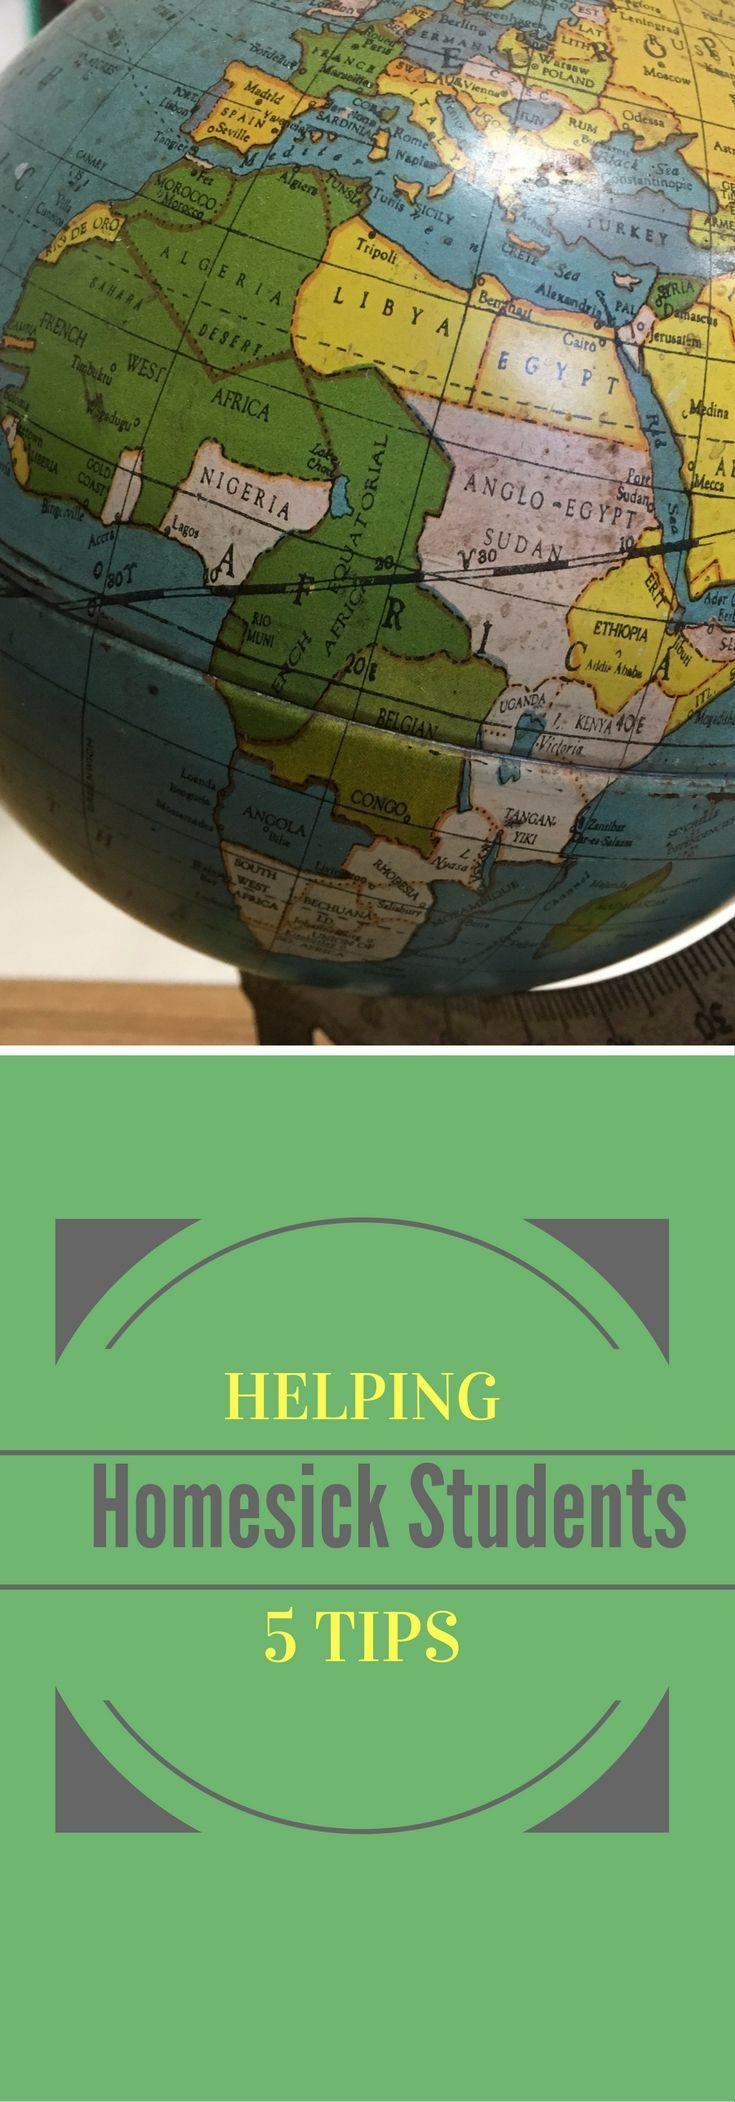 6 Ways to Help Homesick Immigrant Students